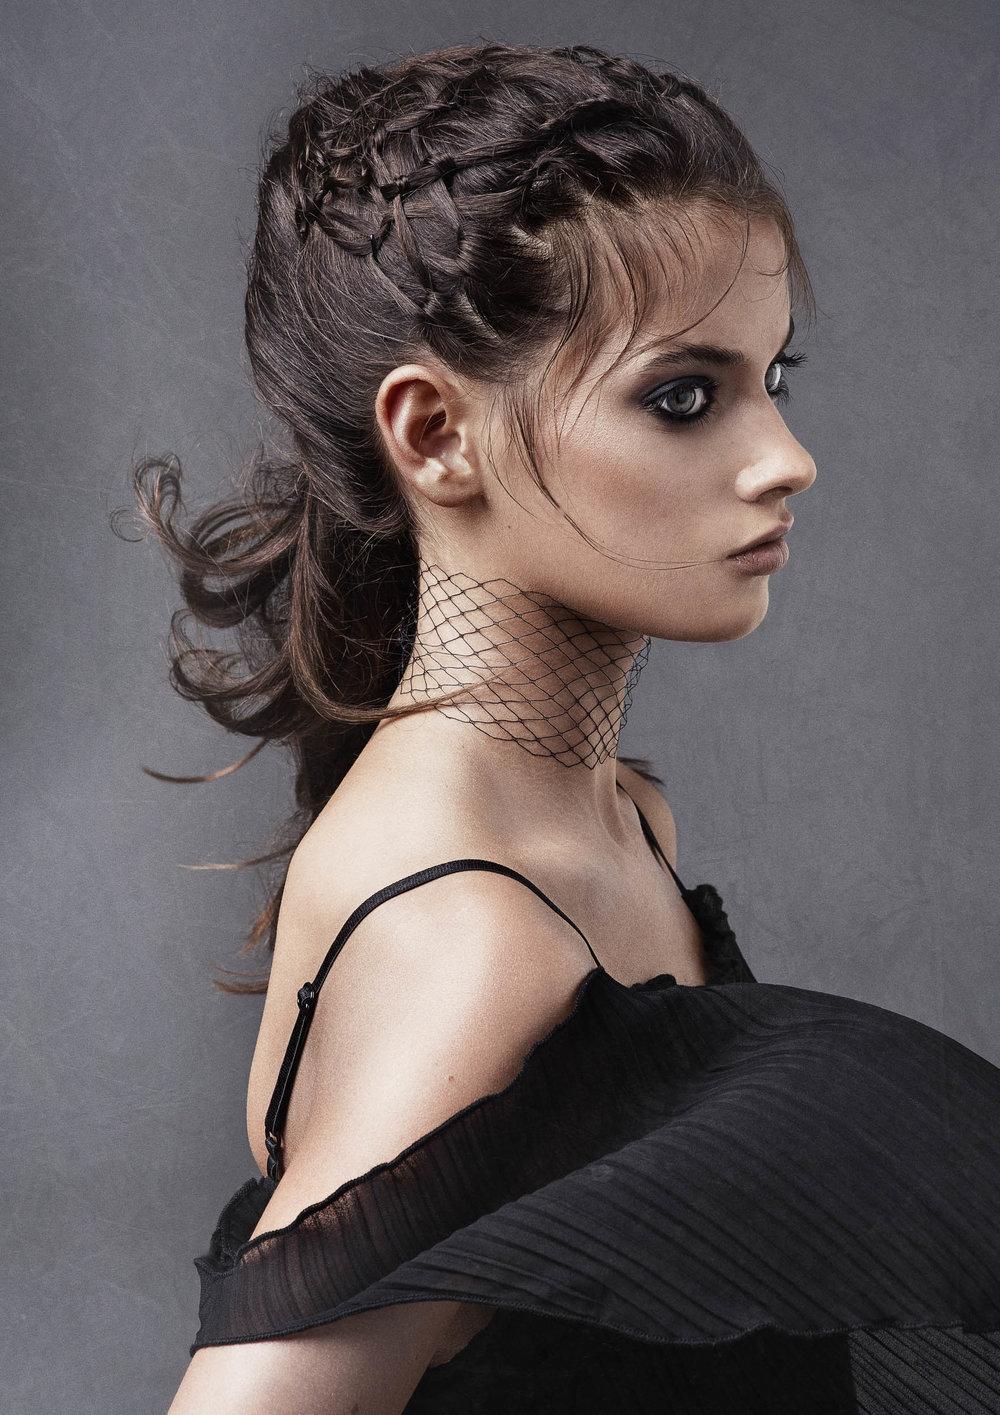 Melbourne photographer Nick Walters model for hair salon shoot2.jpg